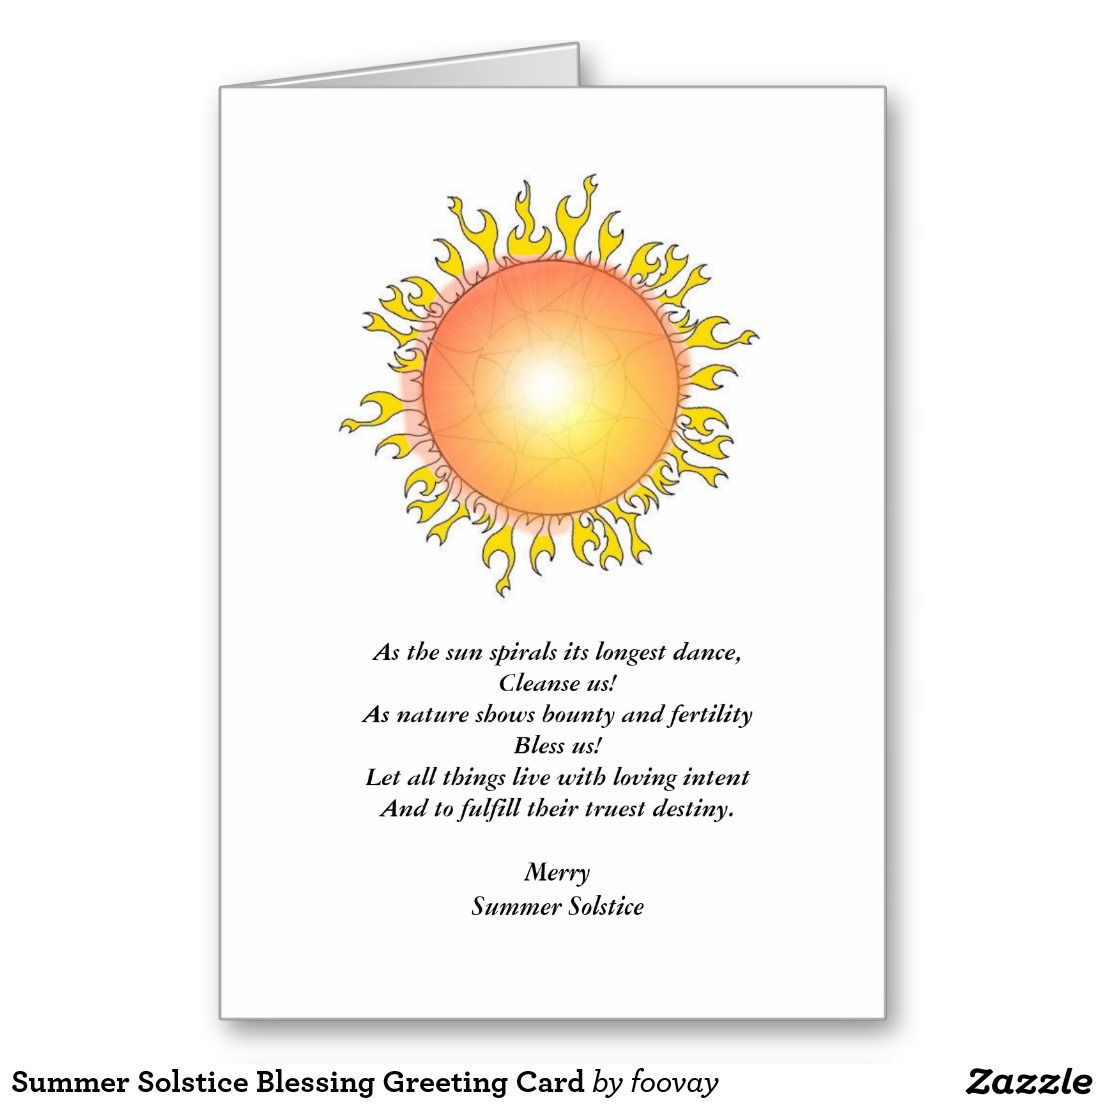 Summer Solstice Blessing Greeting Card | Pinterest | Summer solstice ...